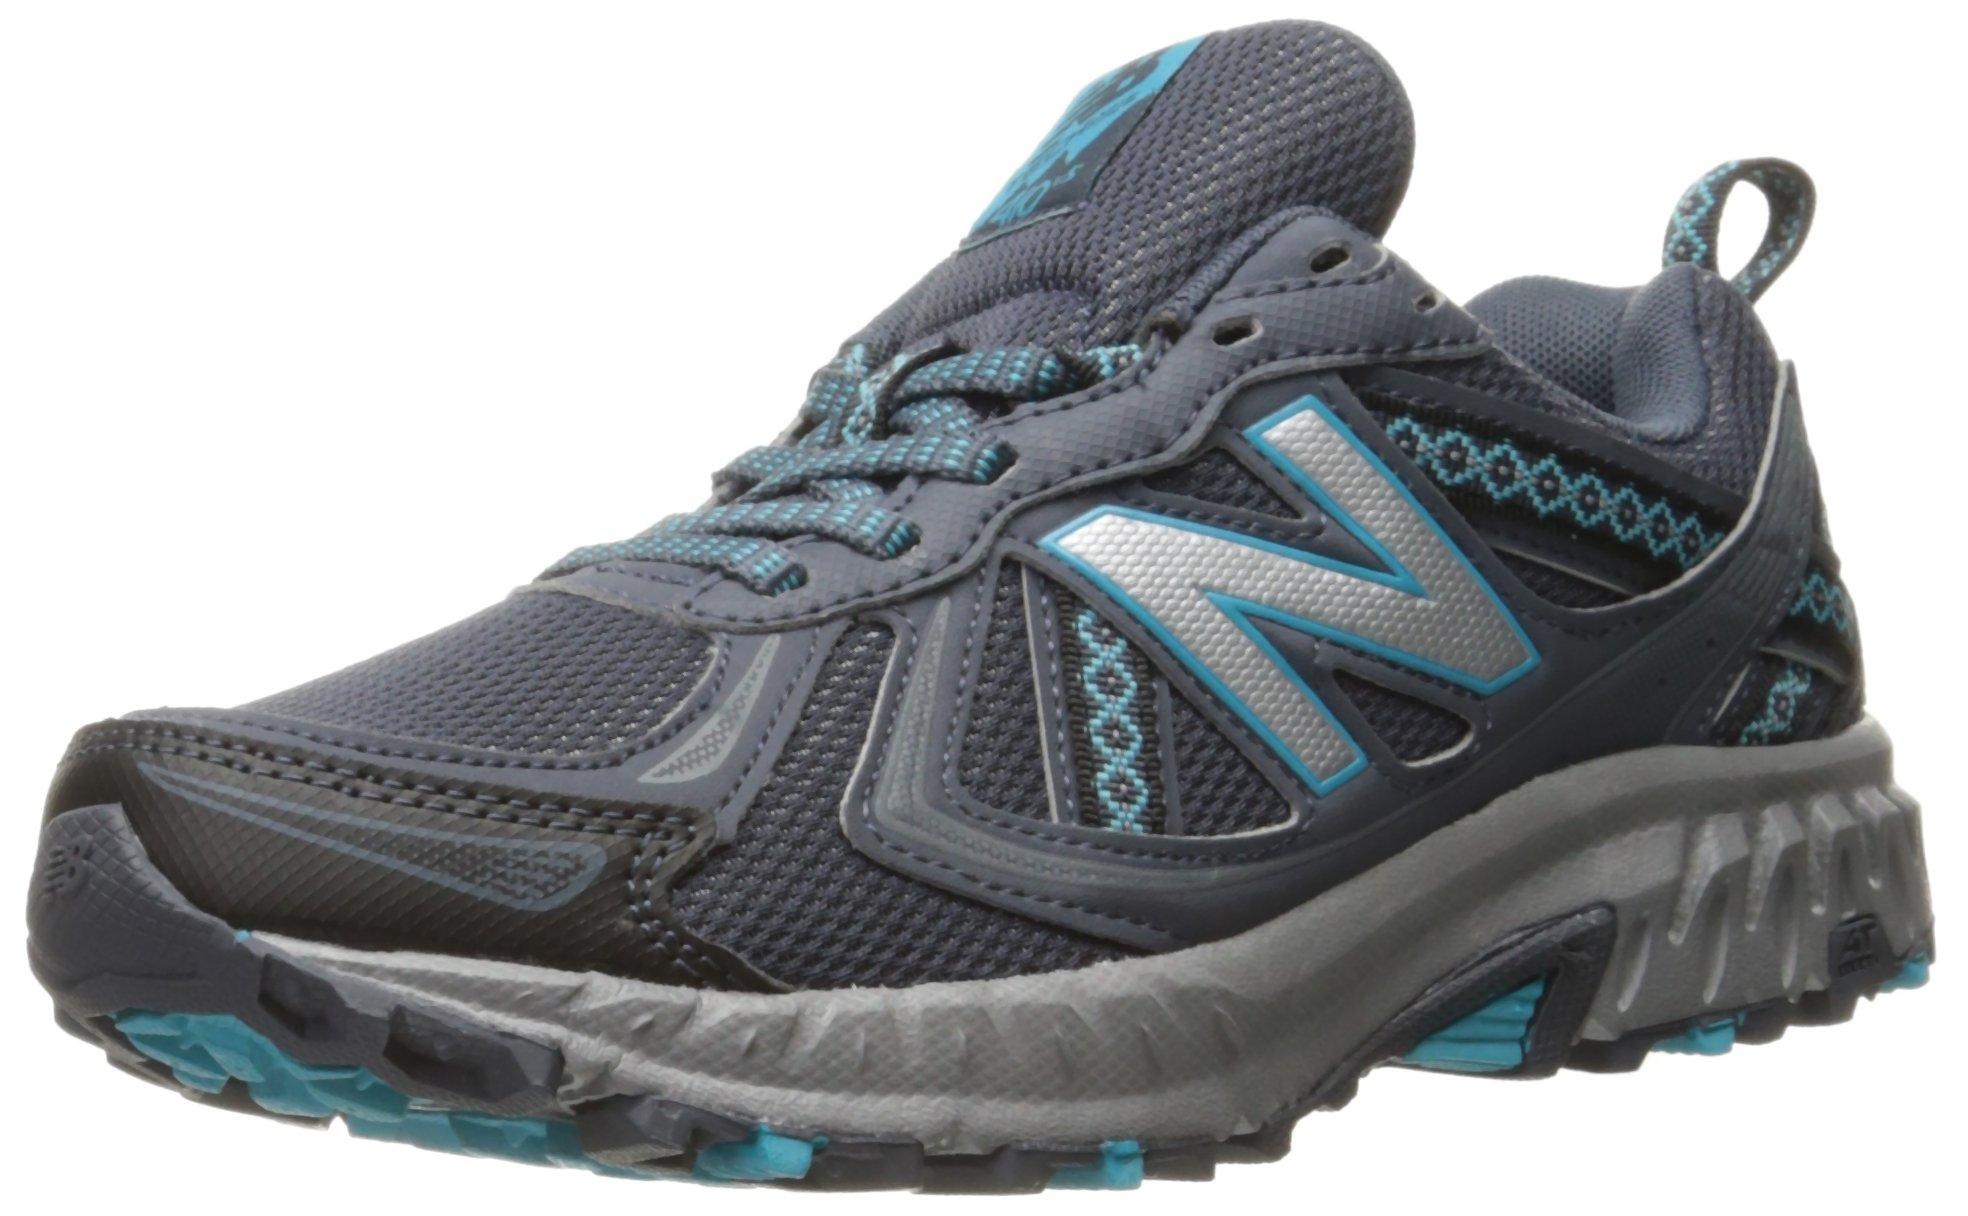 New Balance Women's WT410v5 Cushioning Trail Running Shoe, Grey, 6.5 B US